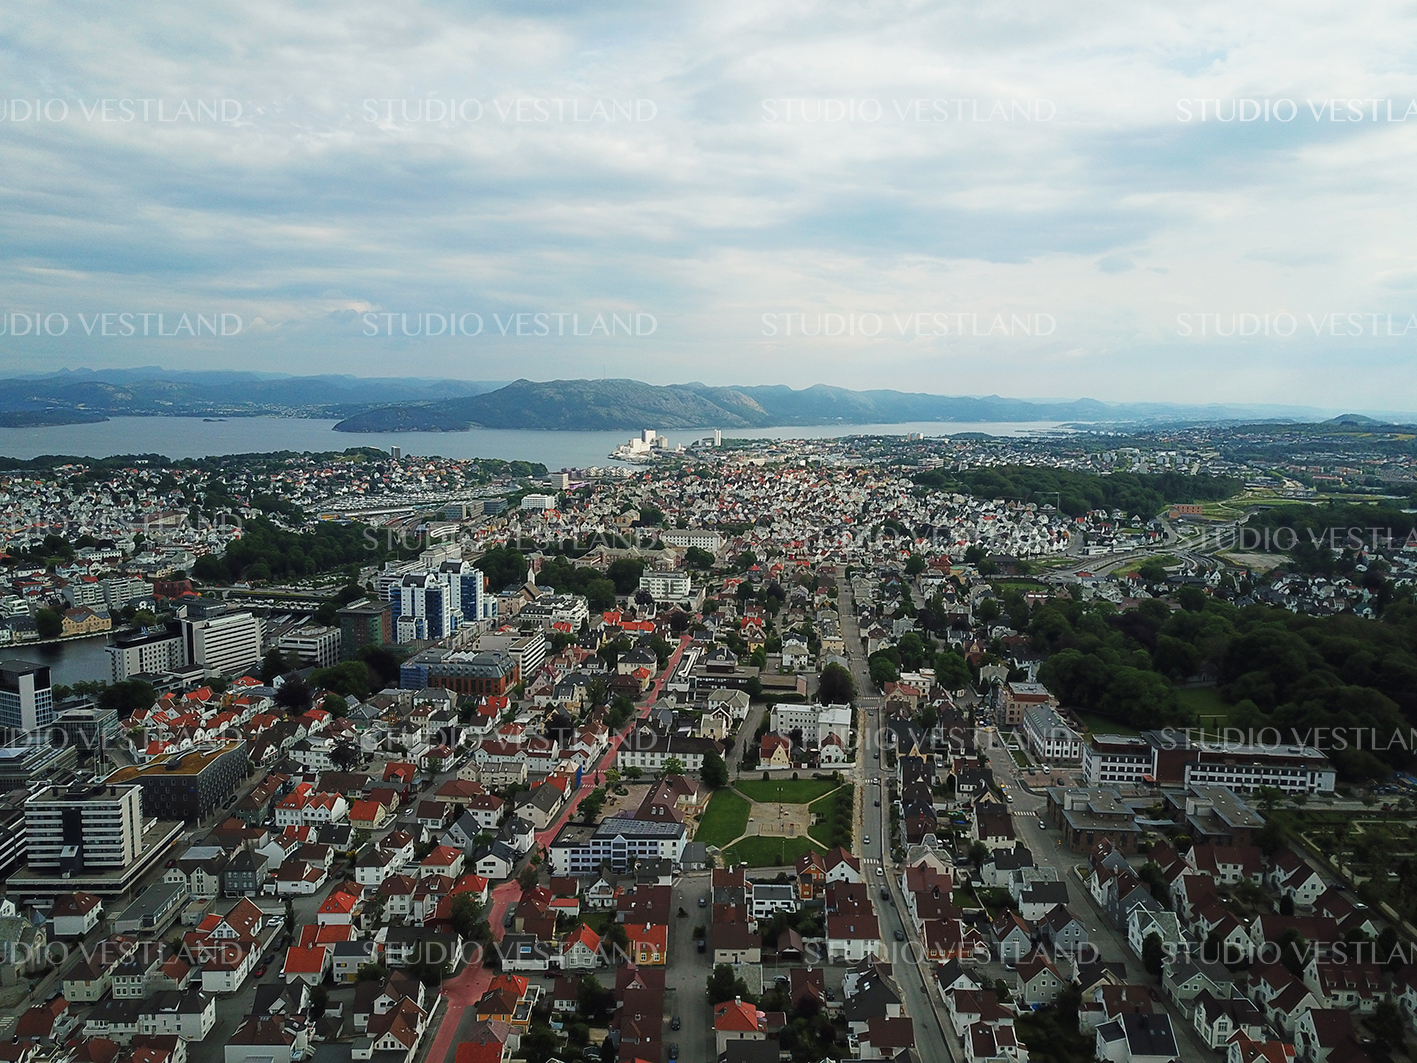 Studio Vestland - Stavanger 05